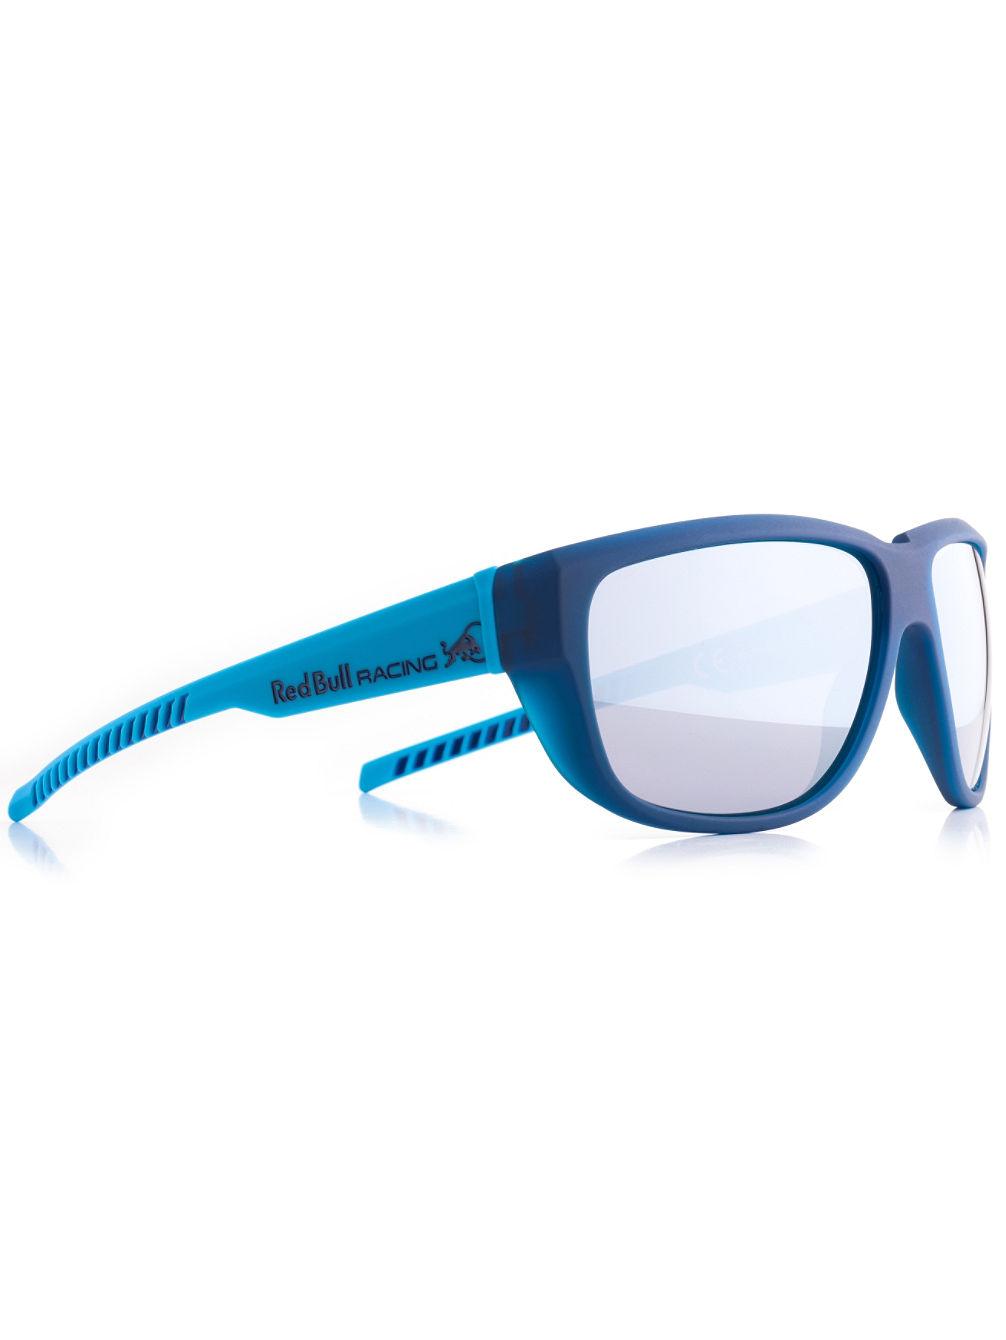 red-bull-racing-eyewear-fade-matte-blue